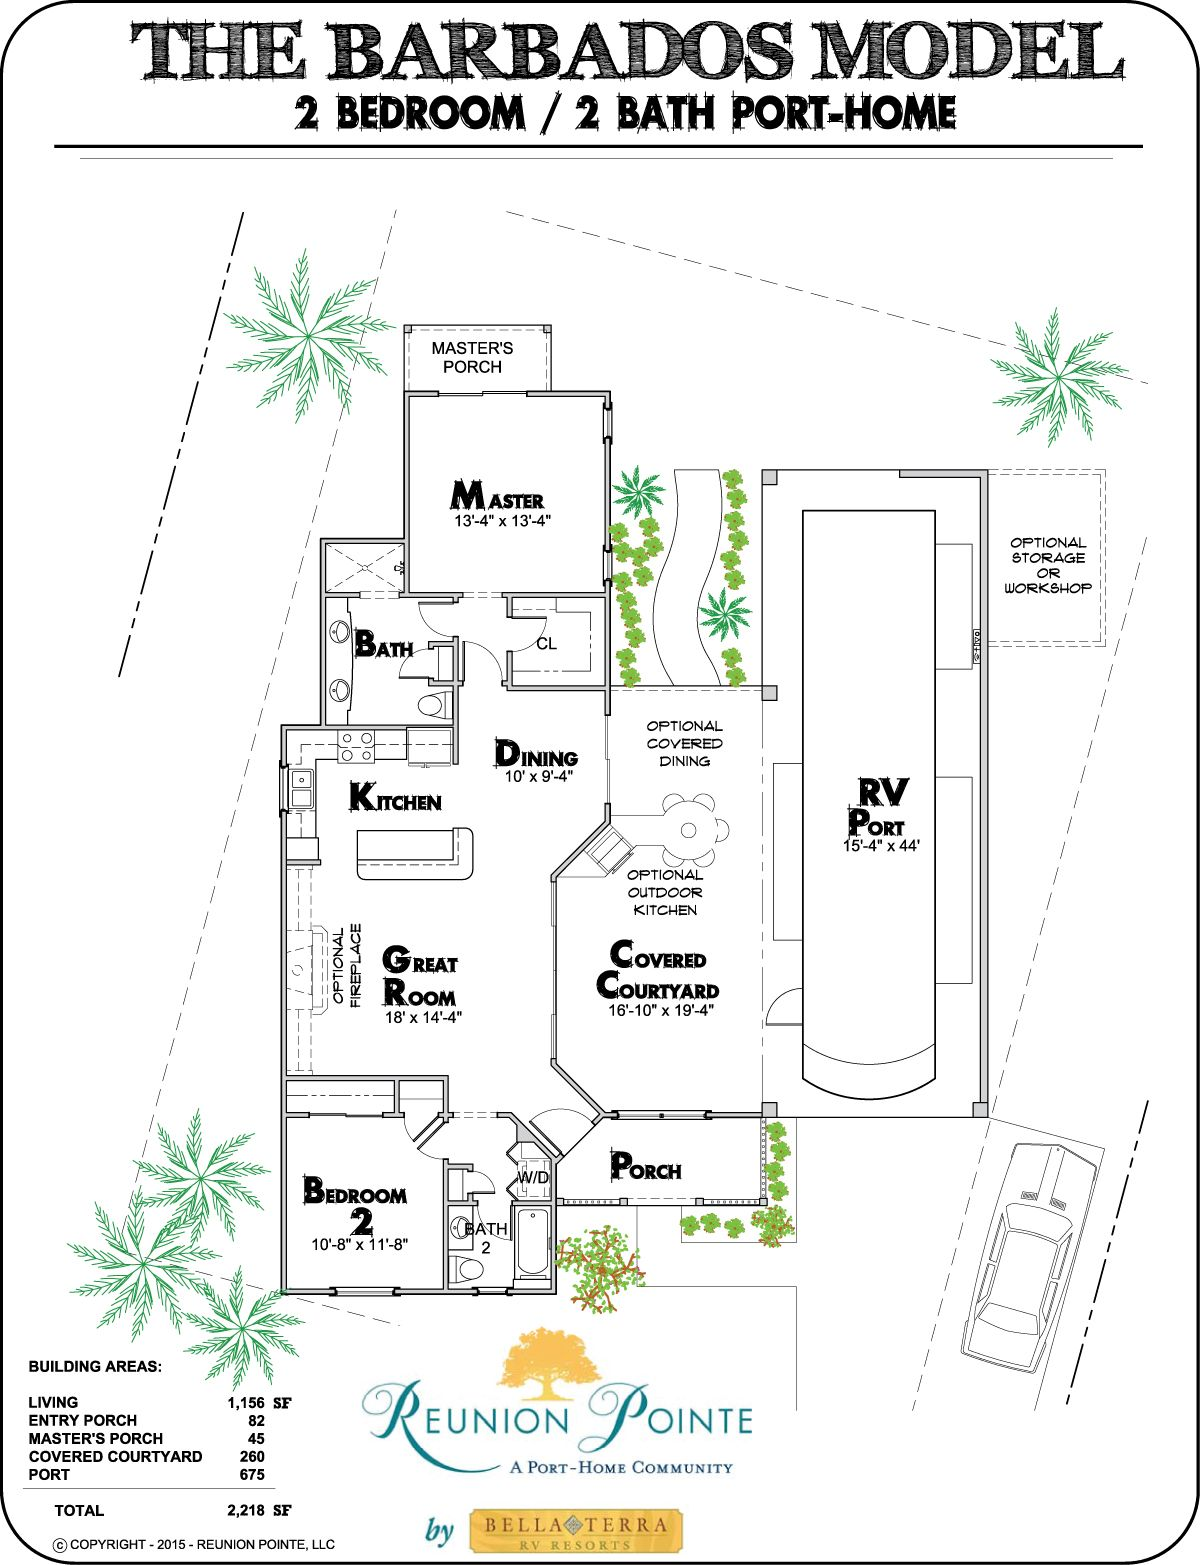 Reunion Pointe features four RVerdesigned floor plans